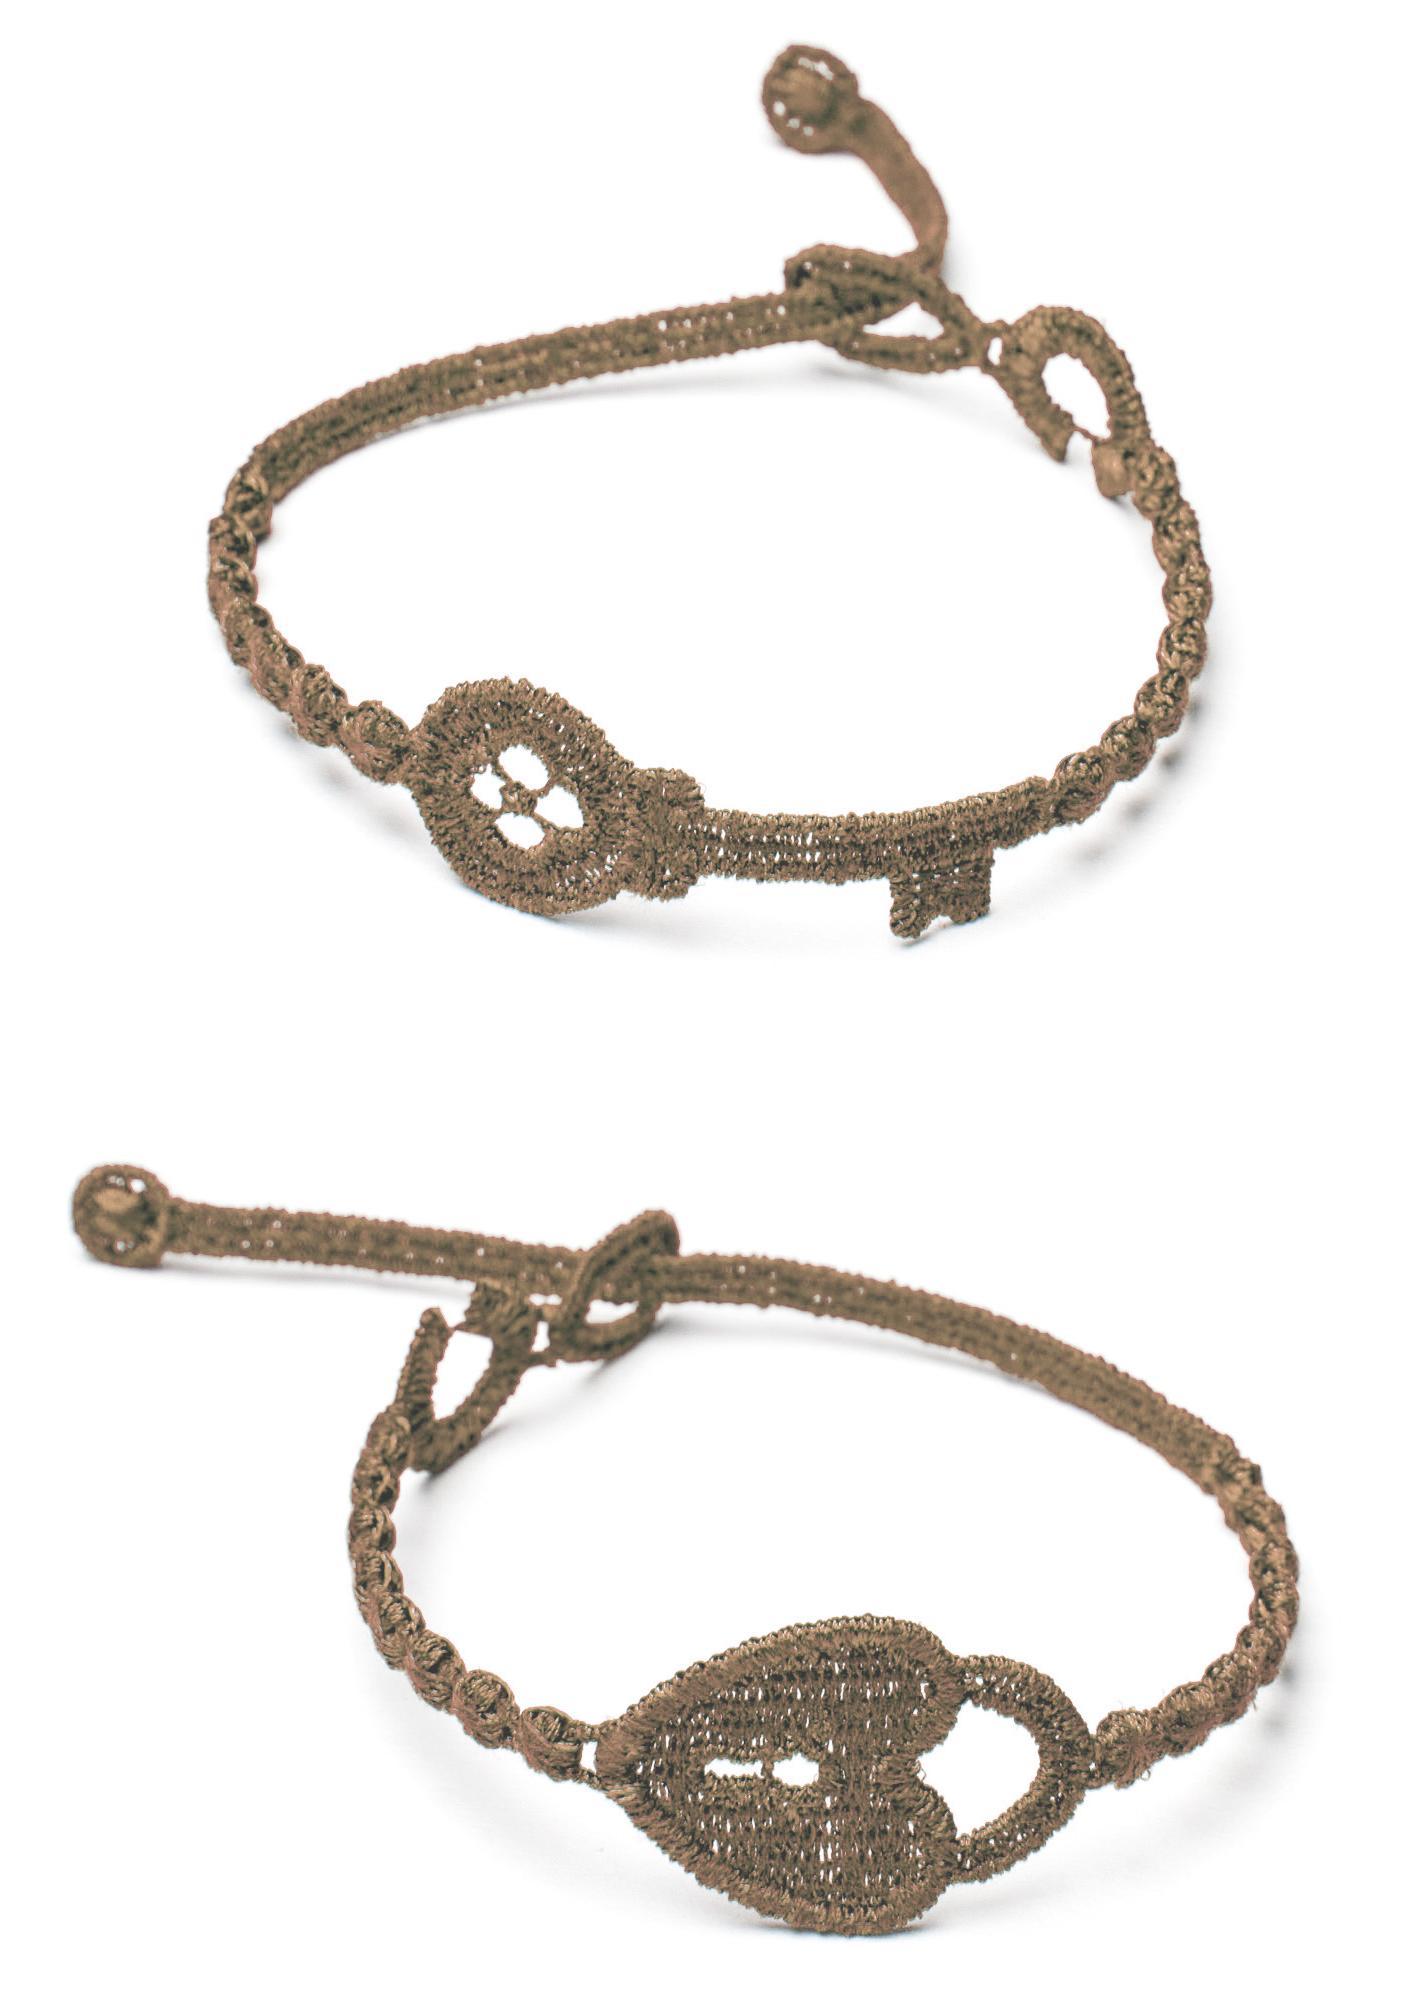 Cruciani Chiave e Lucchetto Bracelet